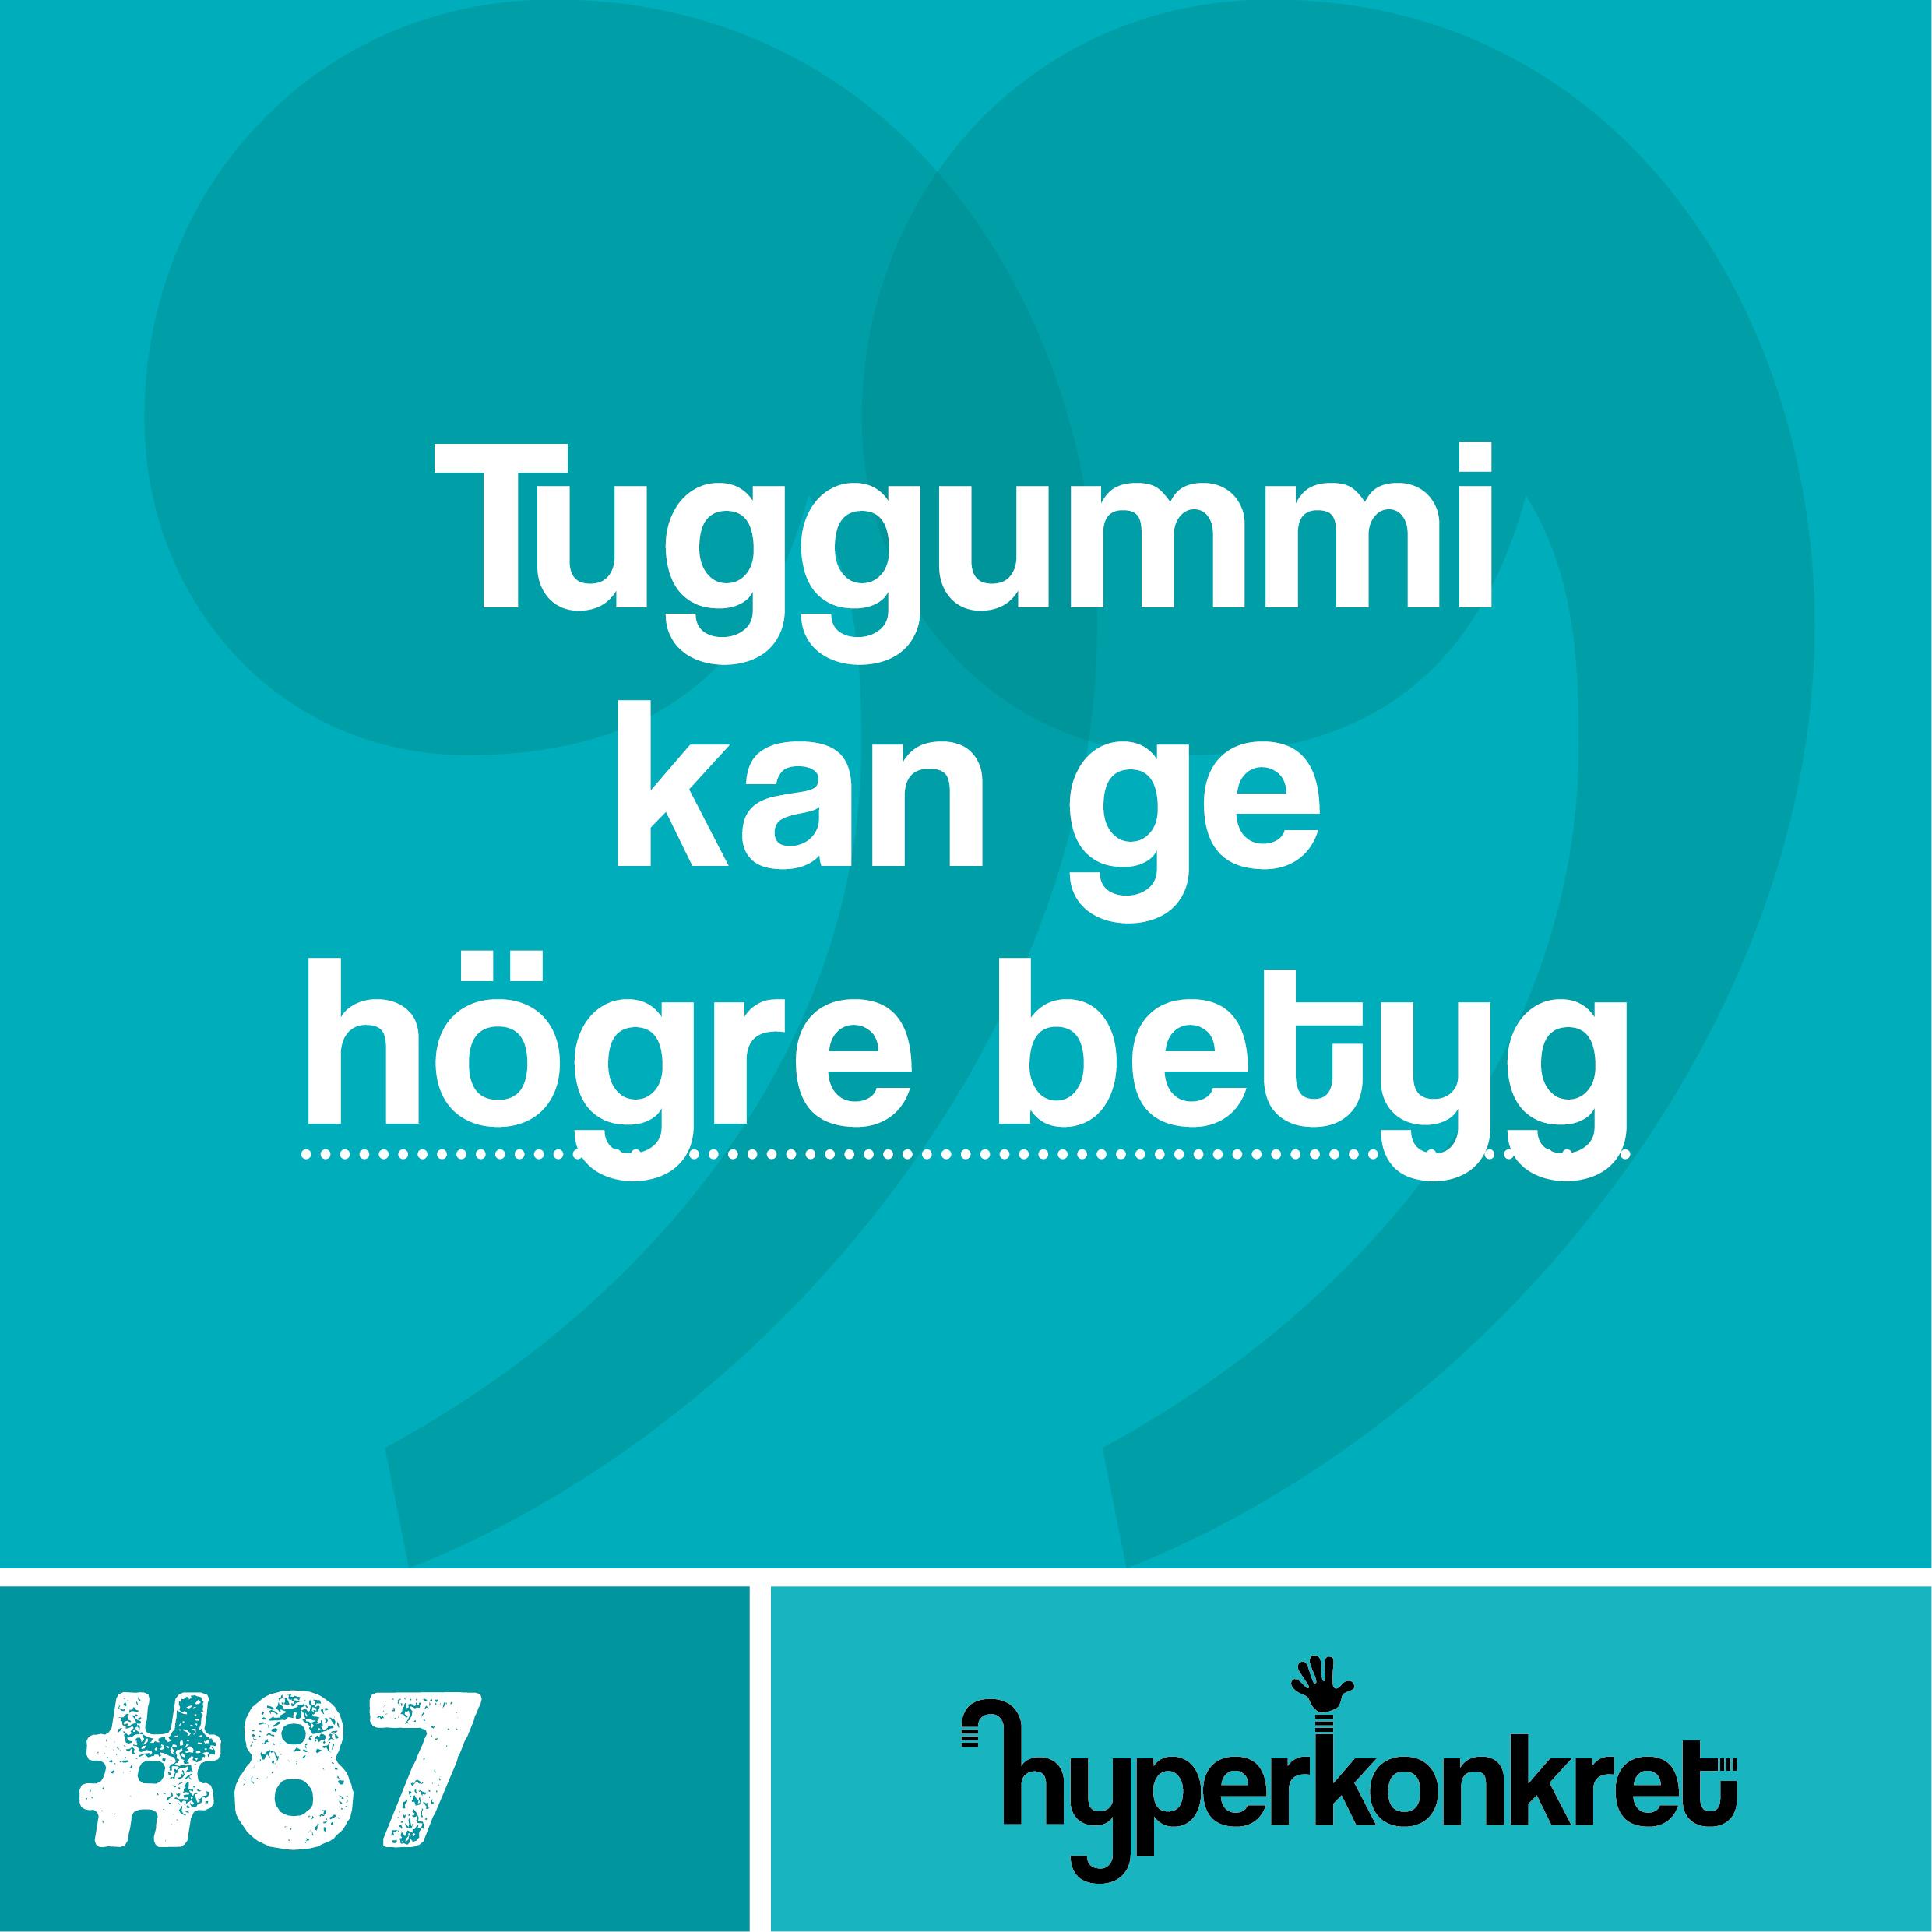 Hypertips #87 – Tuggummin kan ge högre betyg